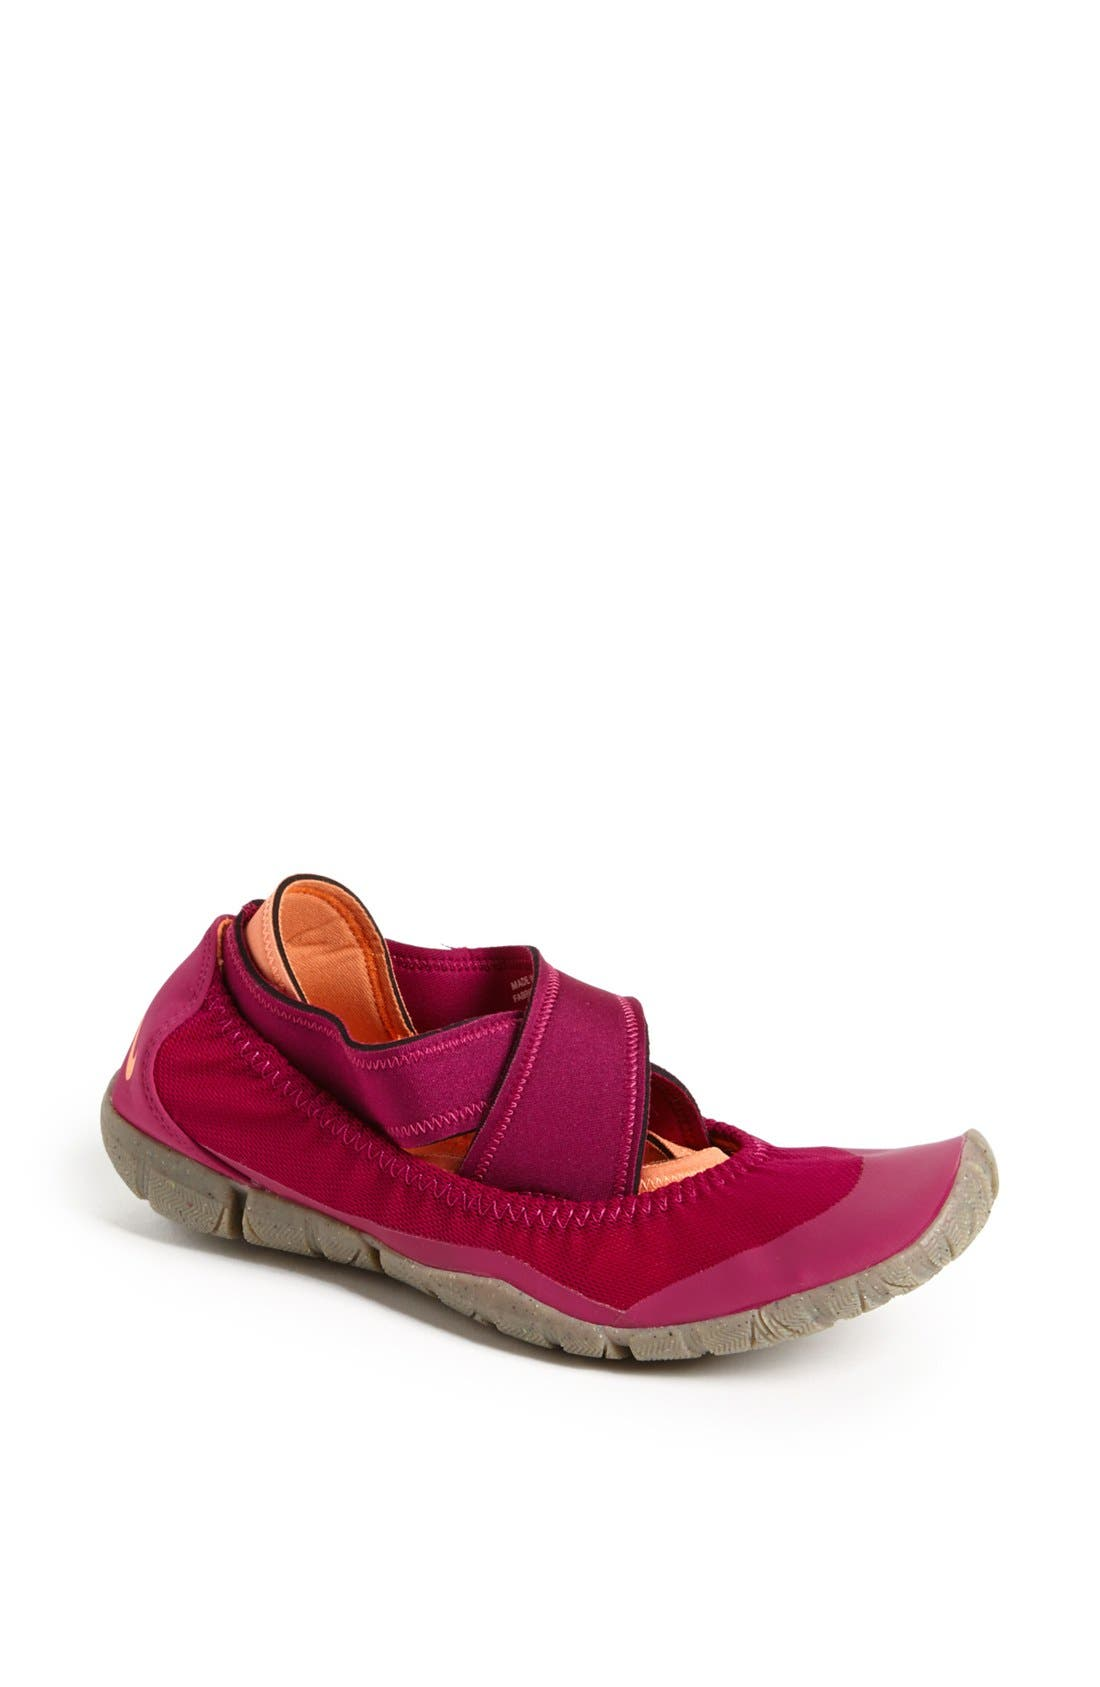 Alternate Image 1 Selected - Nike 'Studio Wrap Pack' Yoga Training Shoe (Women)